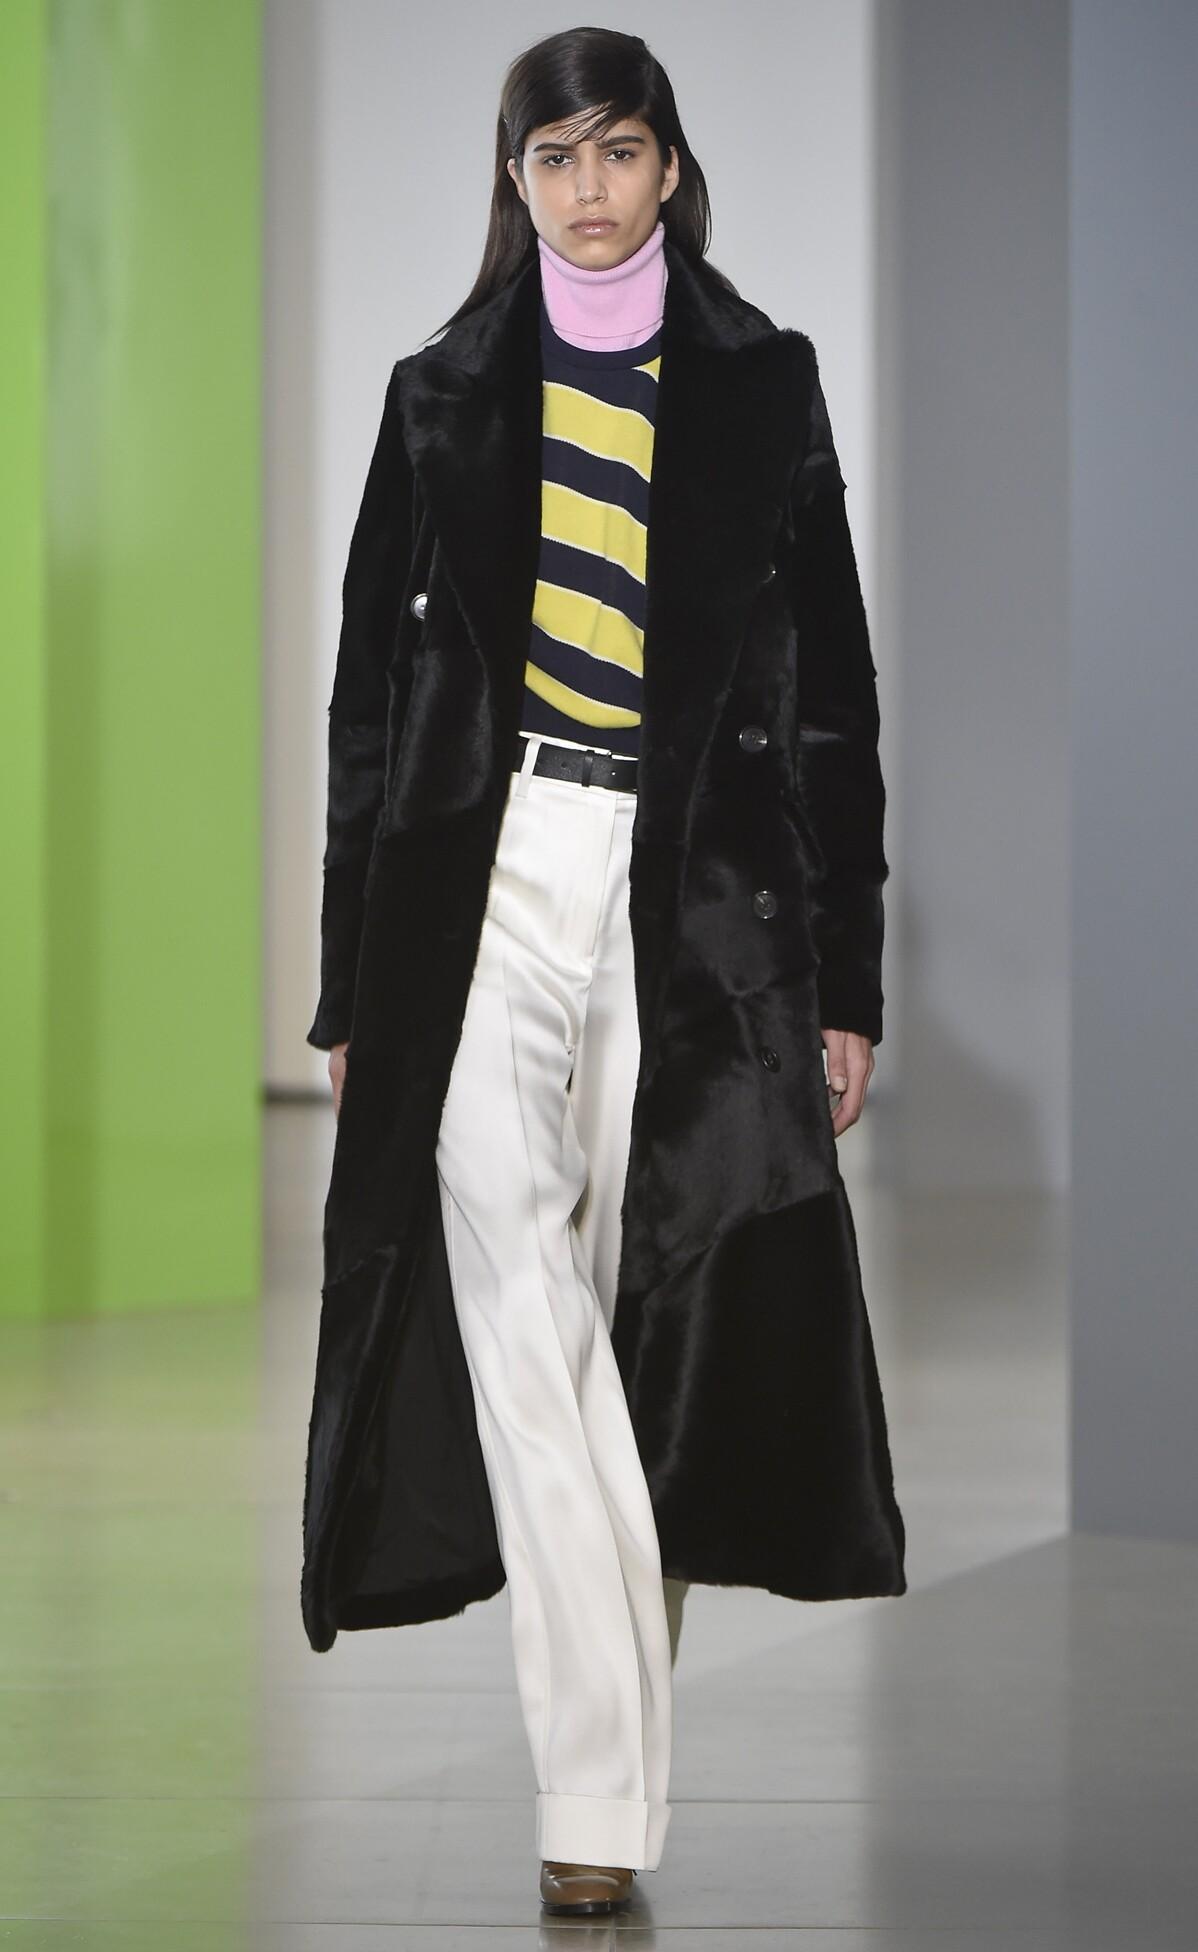 Jil Sander Fall Winter 2015 16 Womenswear Collection Milan Fashion Week Fashion Show